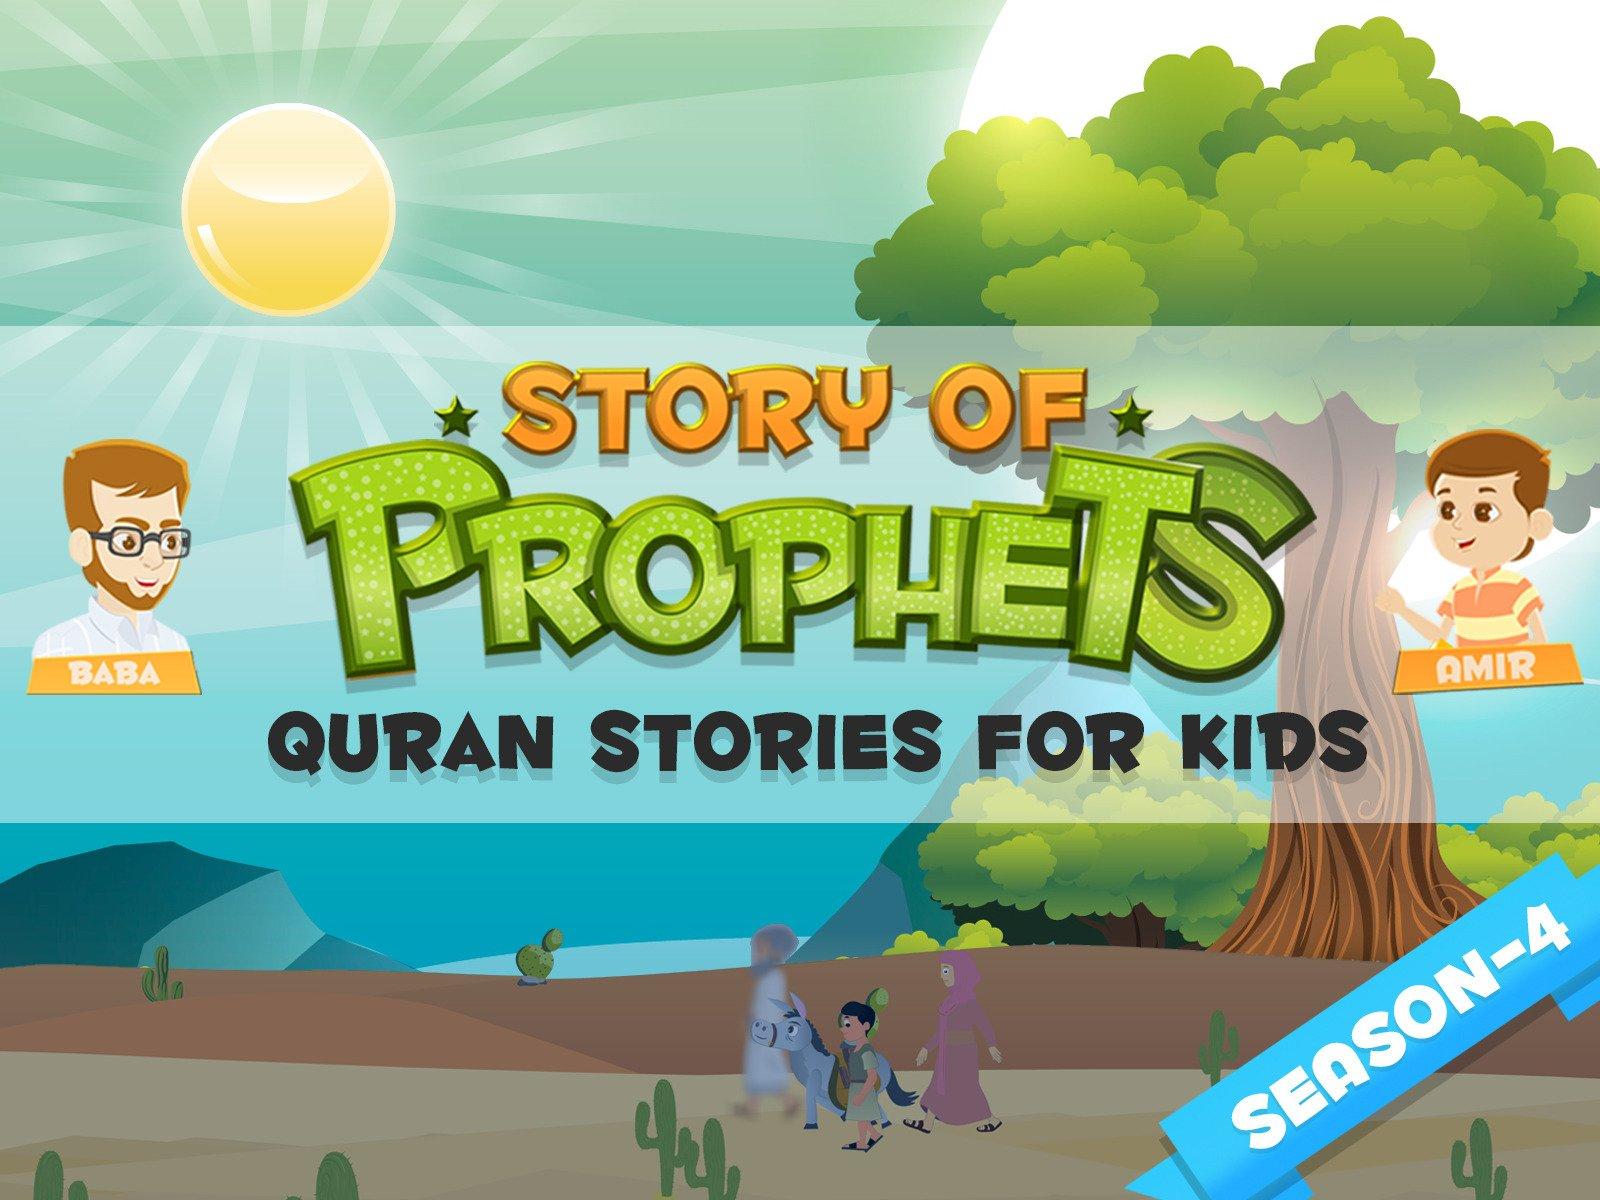 Quran Stories for Kids - Season 4